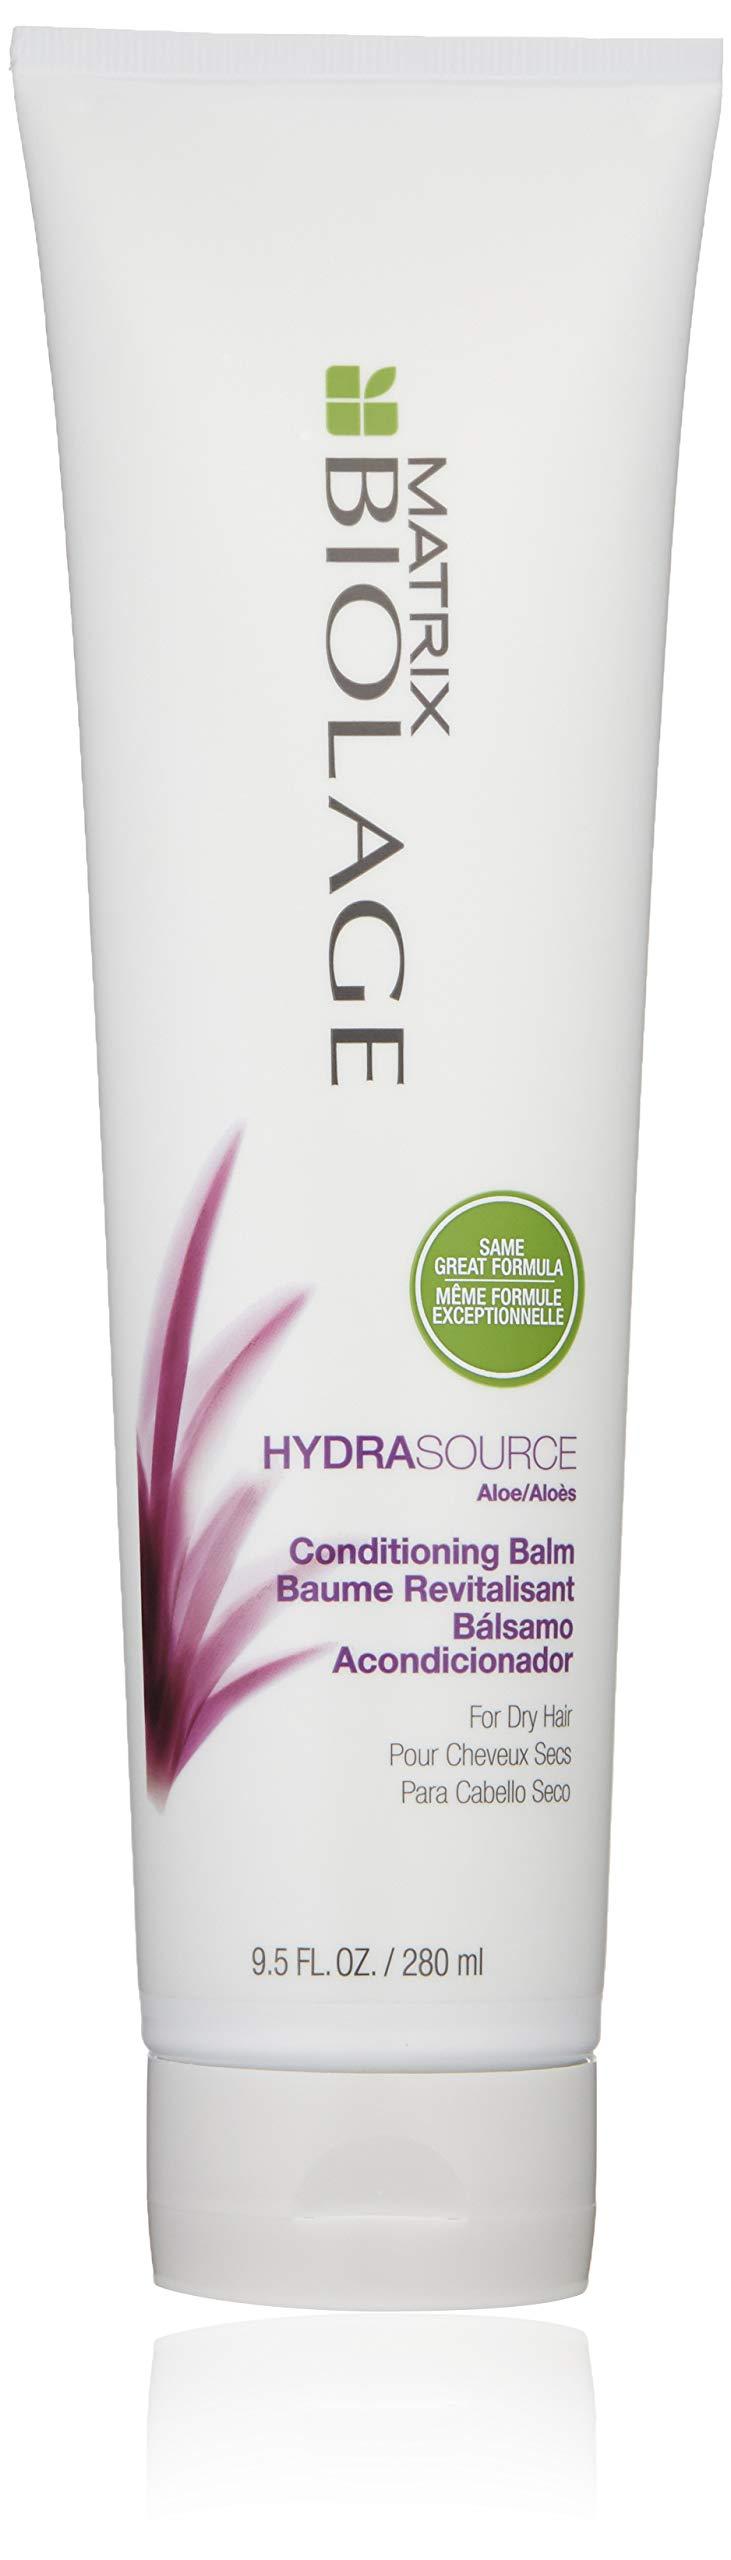 BIOLAGE Hydrasource Conditioning Balm For Dry Hair, 9.5 Fl. Oz.